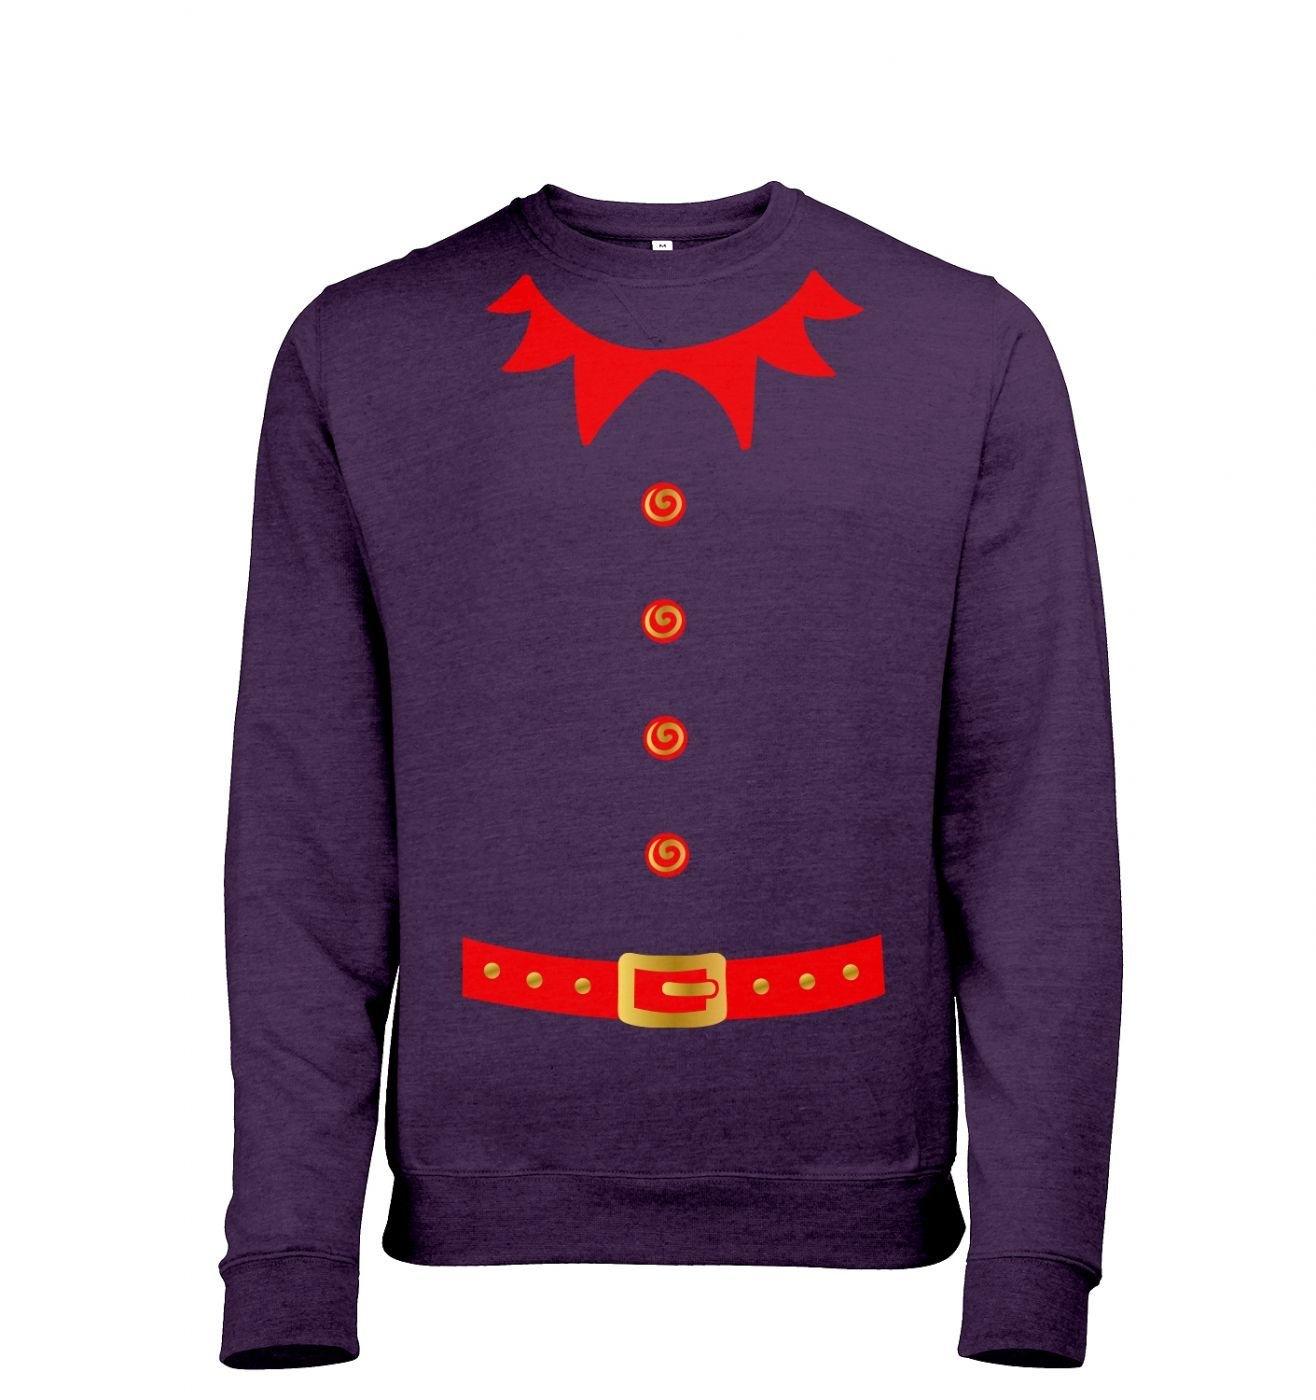 Elf costume (red detail) sweatshirt (heather)